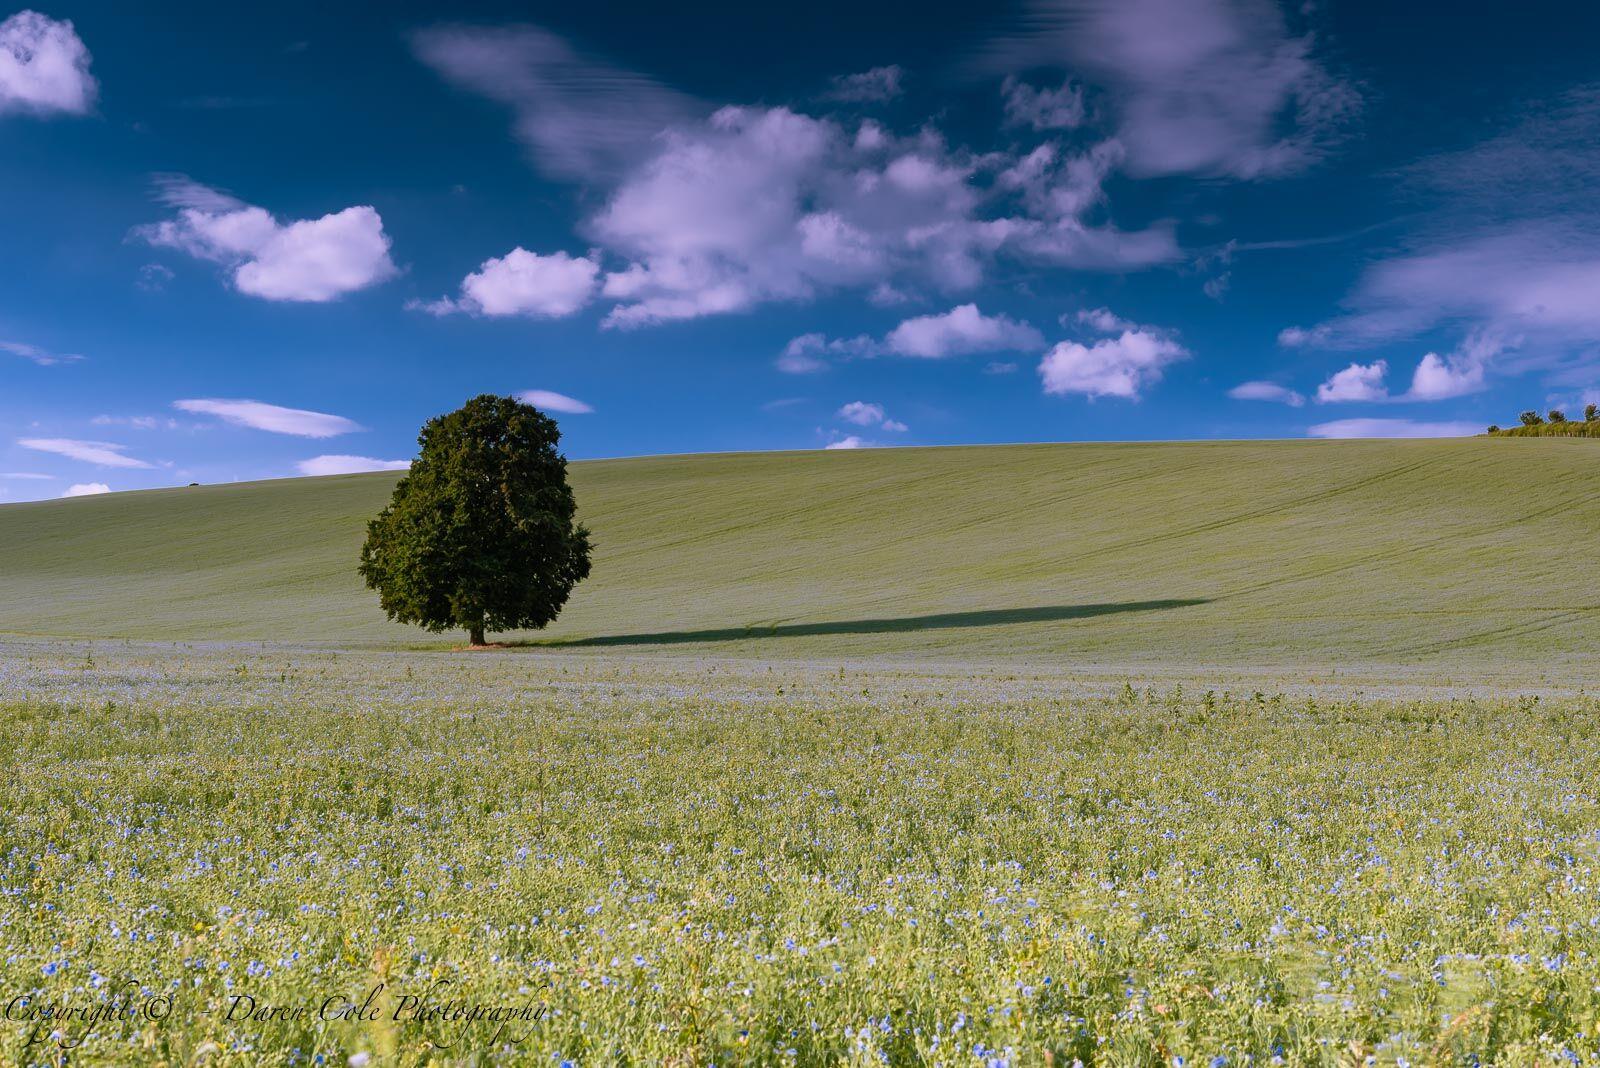 Tree Shadow Blue Sky Clouds